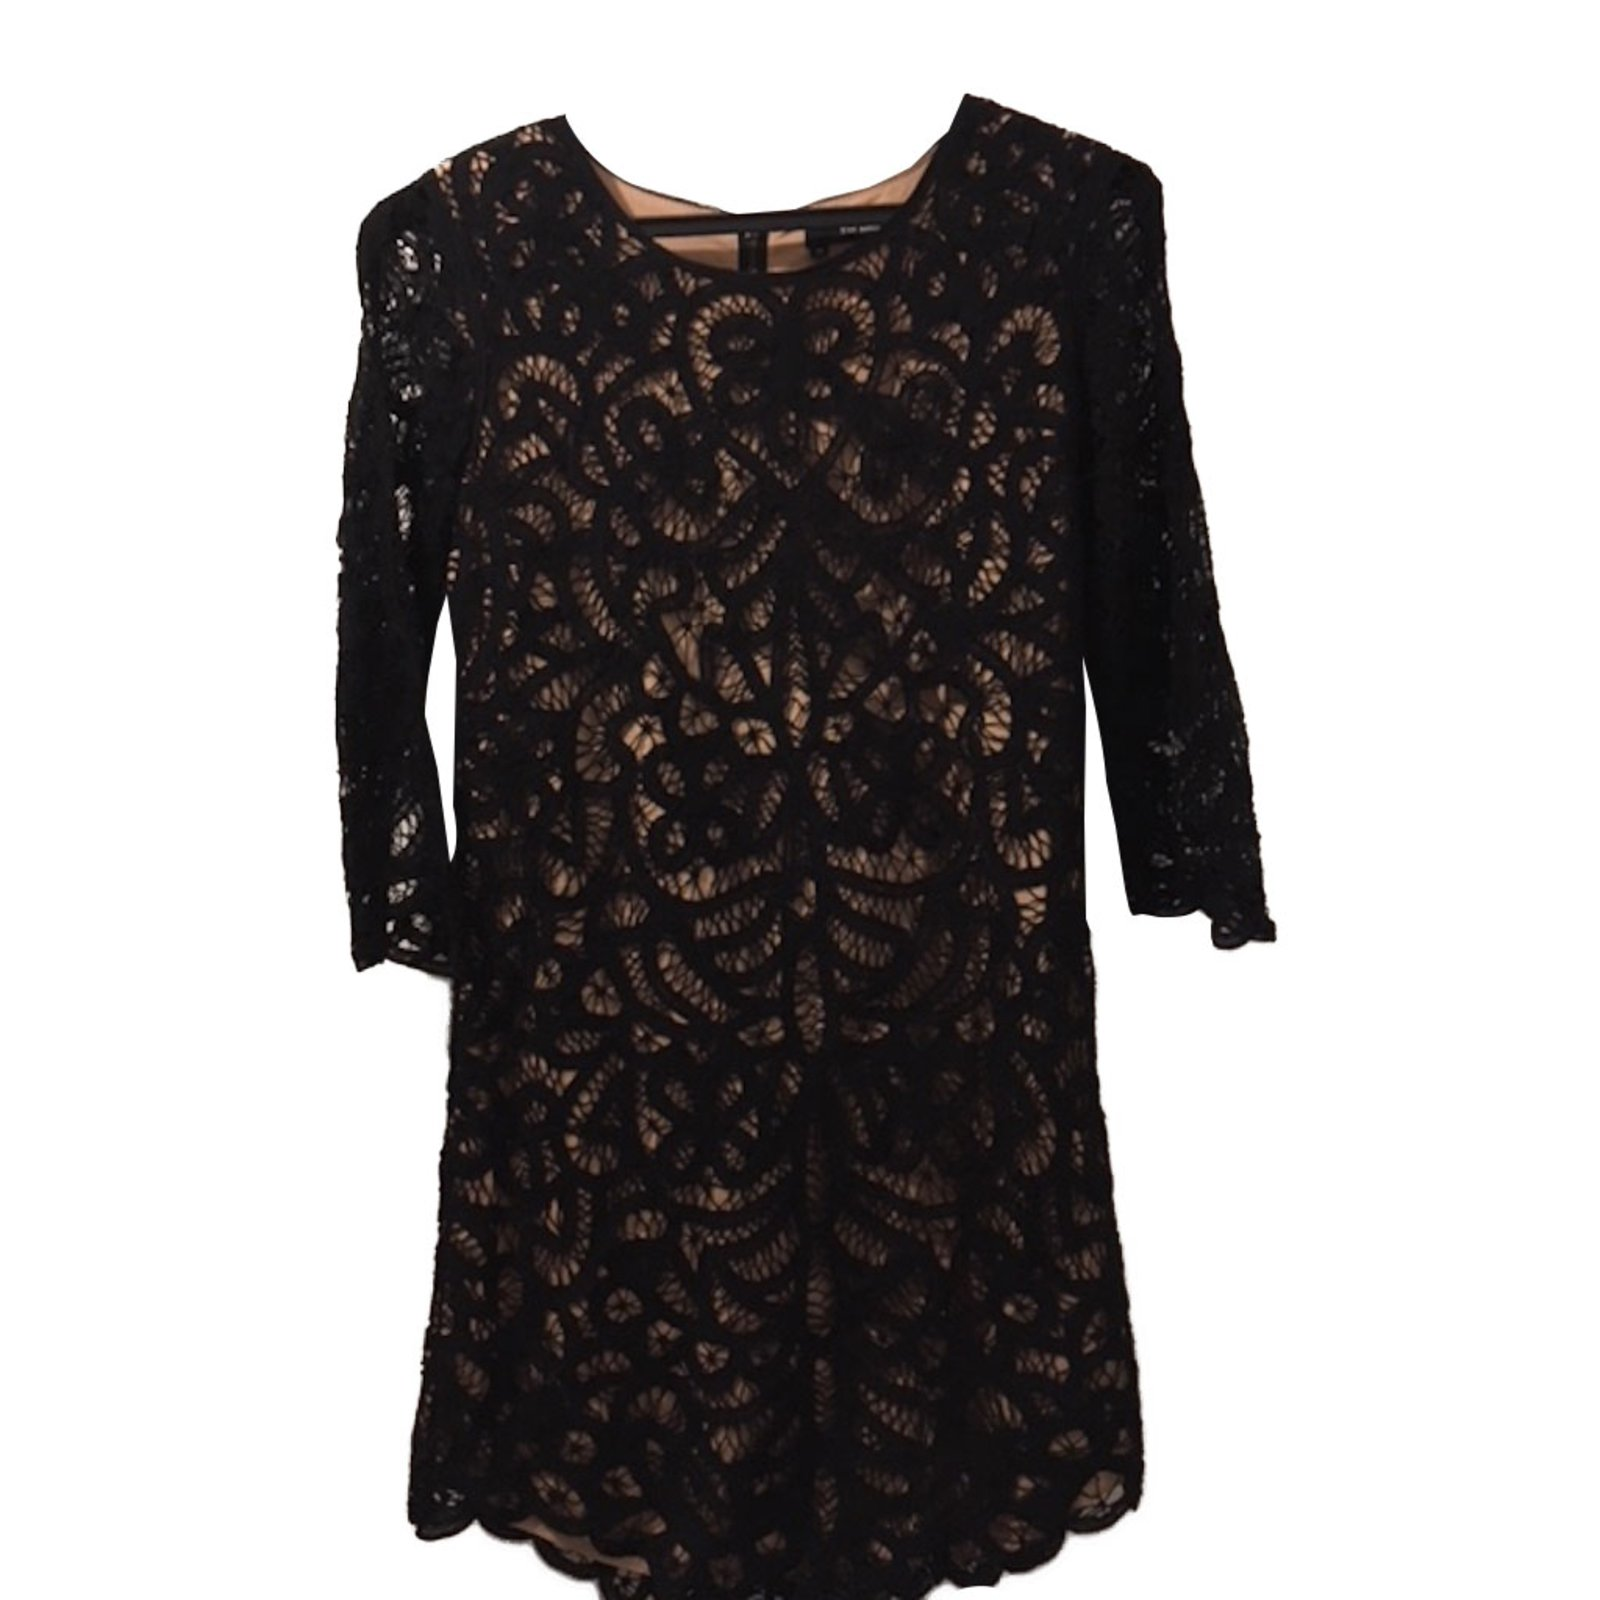 96c31f54d9a The Kooples Lace dress Dresses Lace Black ref.87841 - Joli Closet